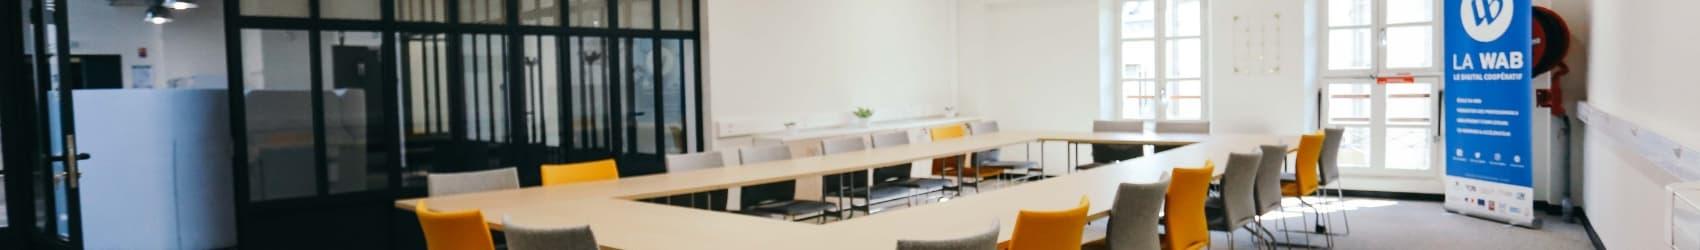 louer-salle-de-reunion-a-bergerac-pour-seminaire.jpg